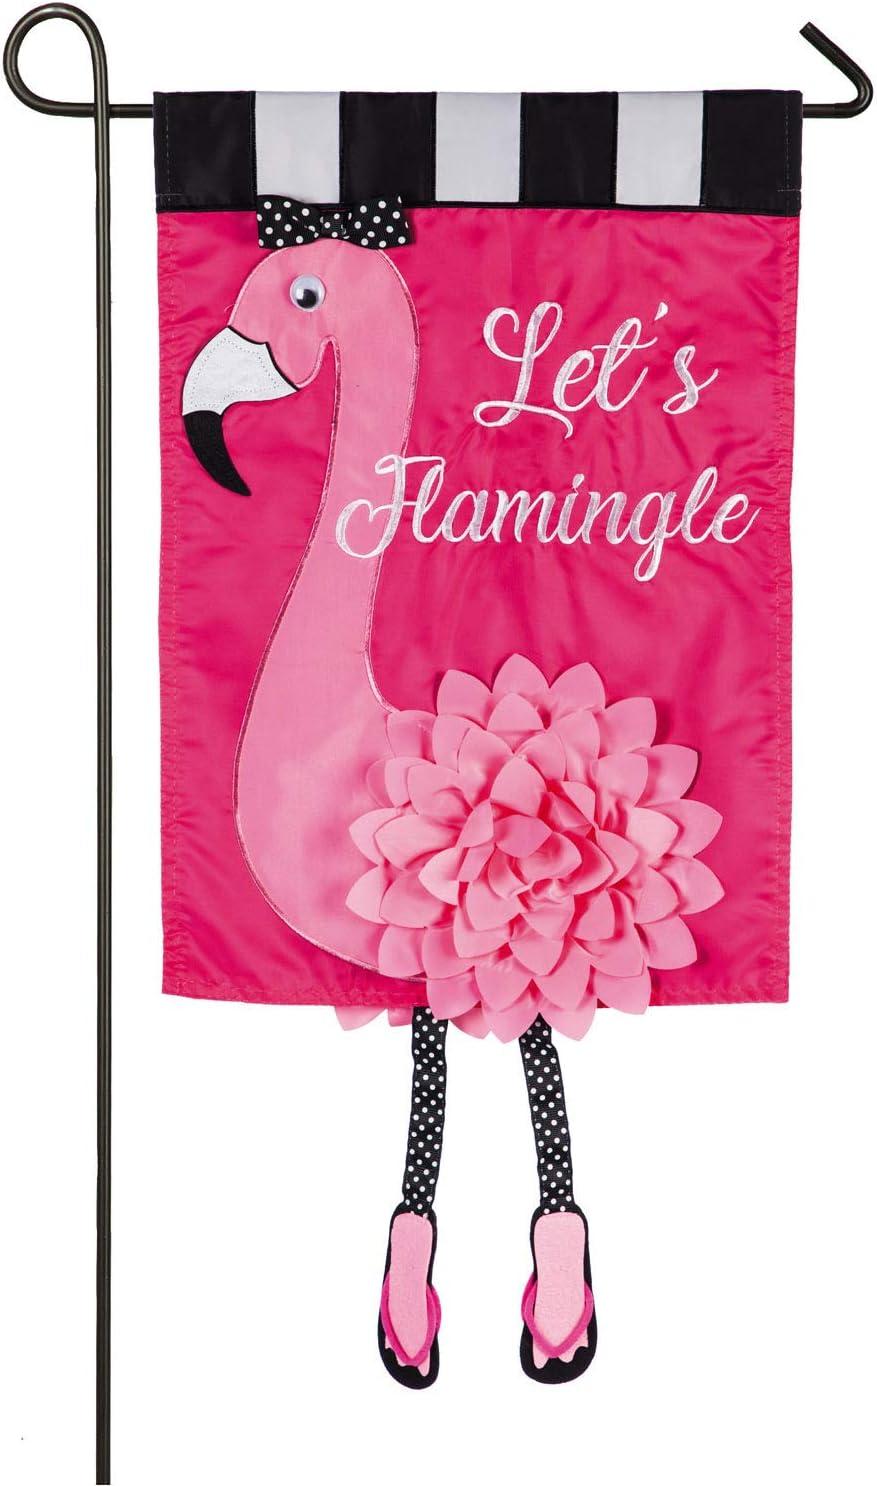 Evergreen Flag Let's Flamingle Applique Garden Flag - 12.5 x 18 Inches Outdoor Decor for Homes and Gardens